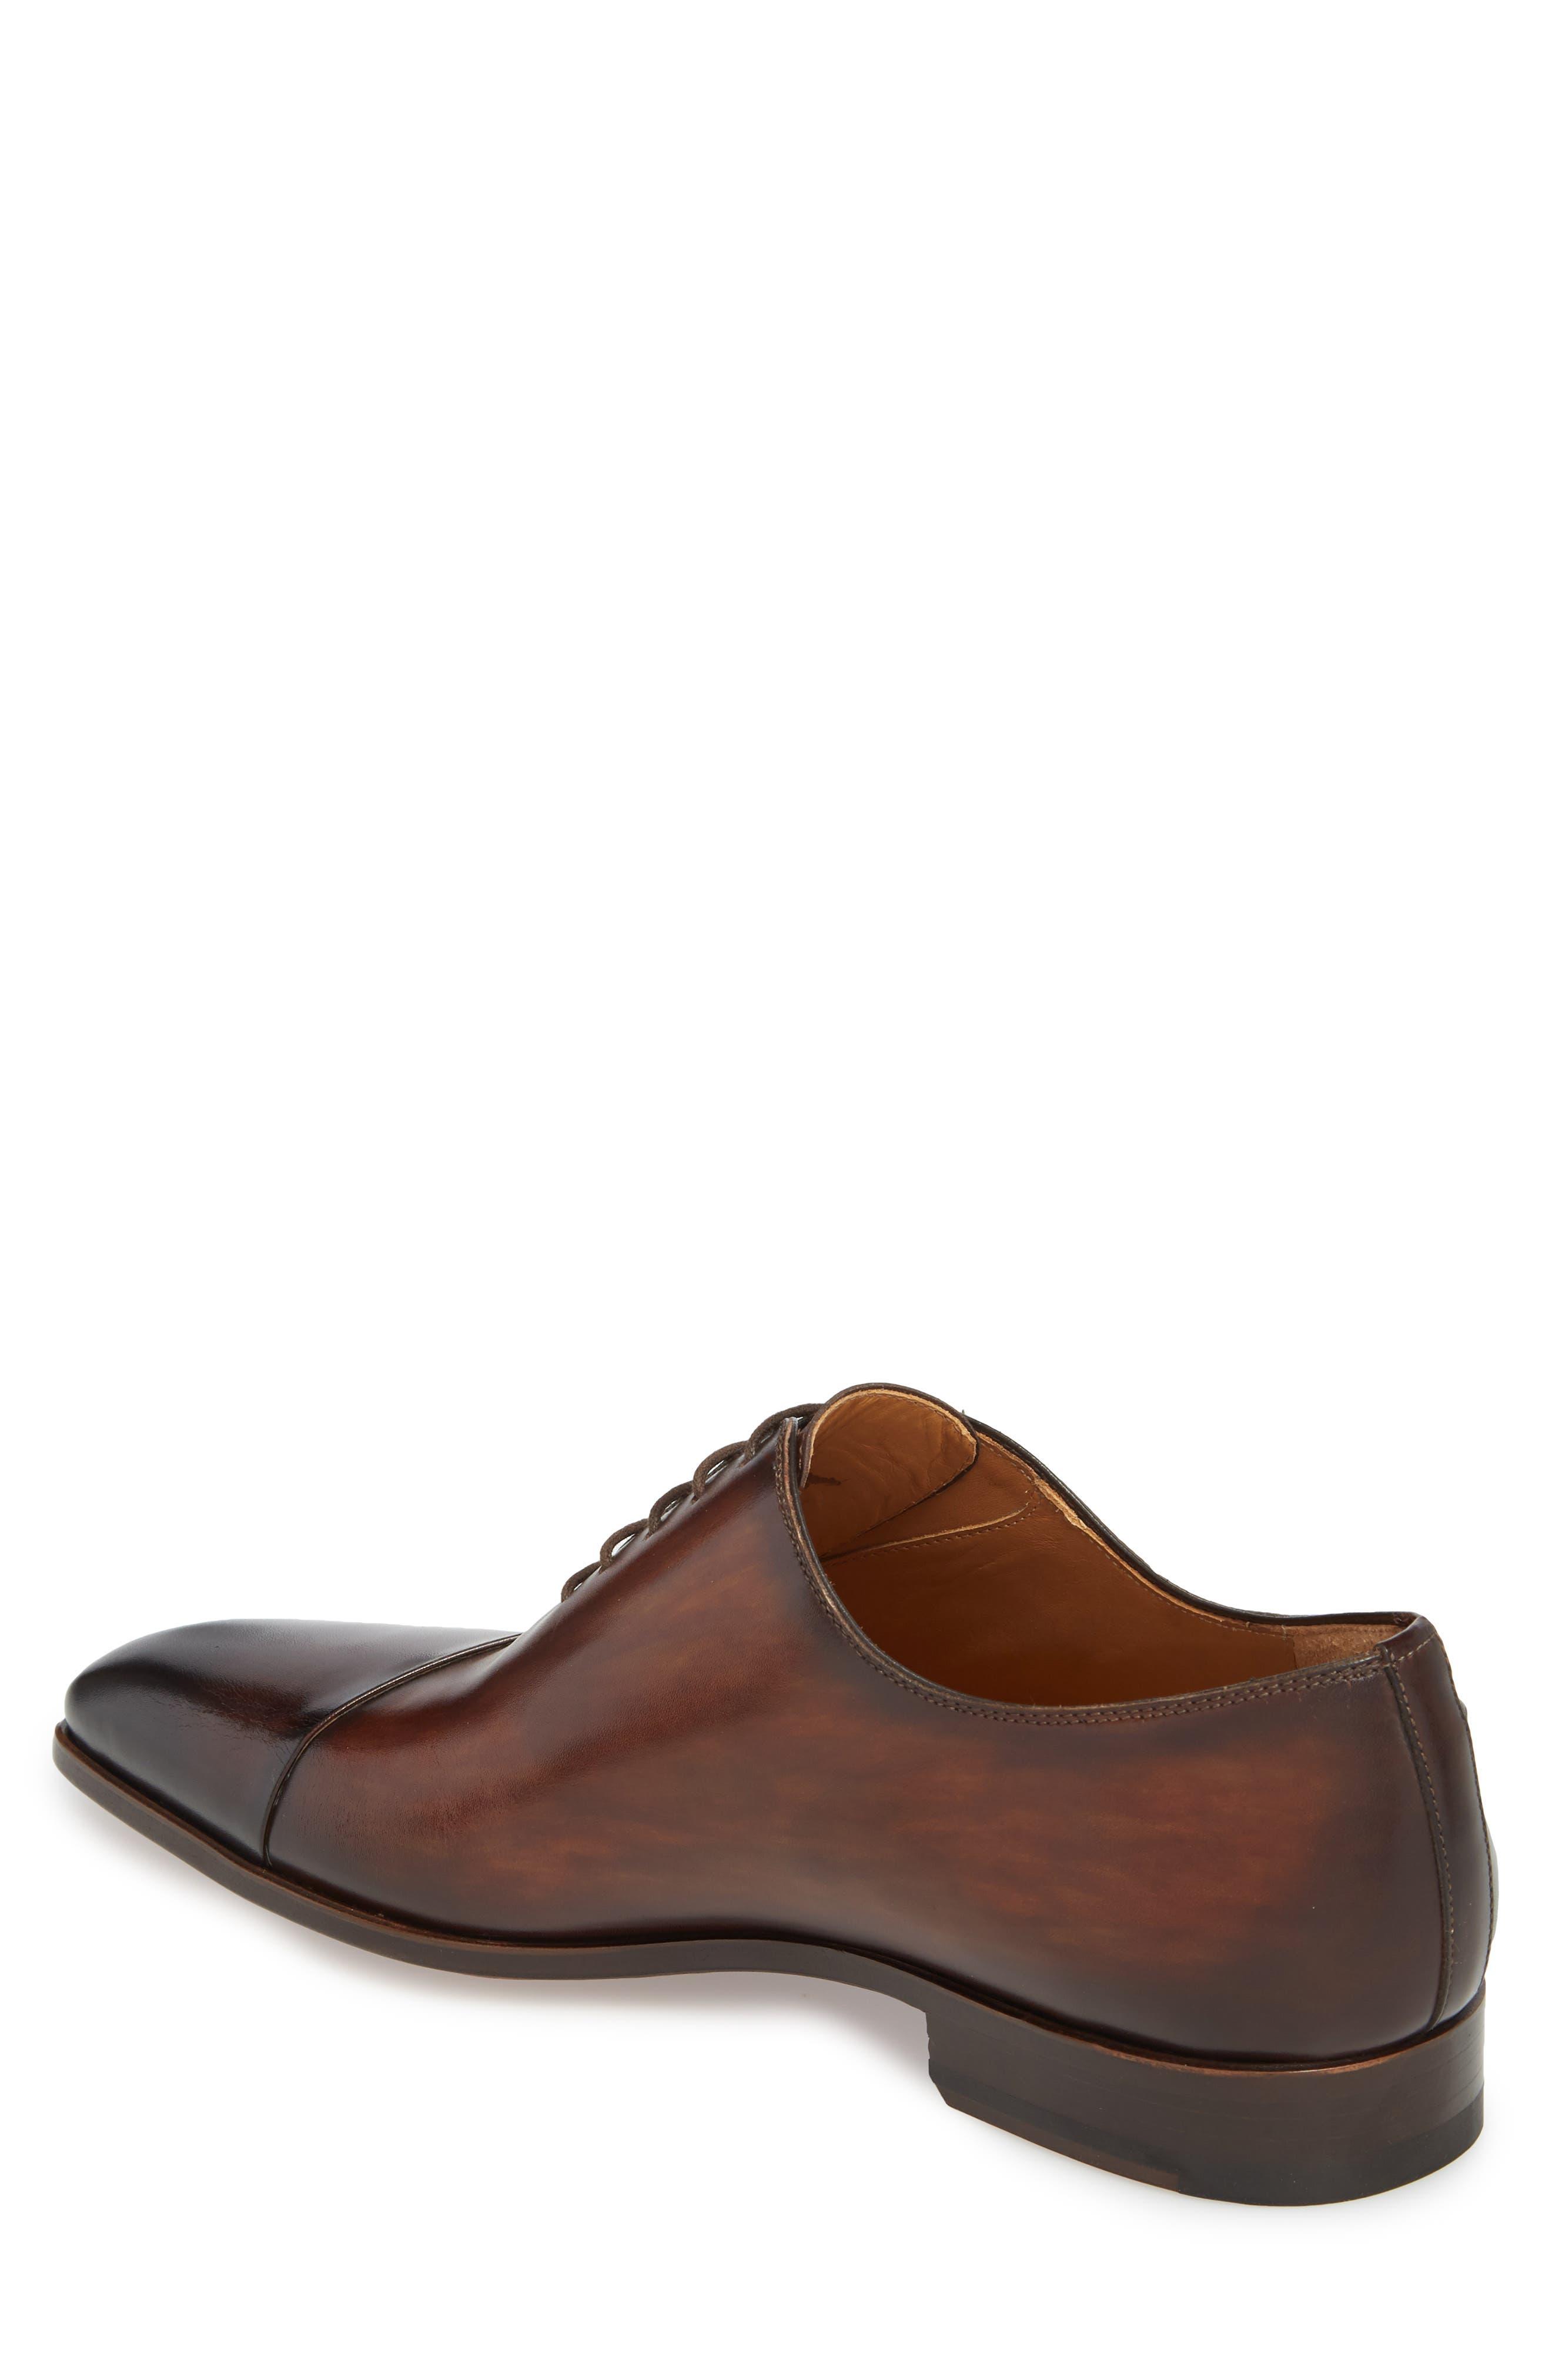 Cristiano Asymmetrical Whole Cut Shoe,                             Alternate thumbnail 2, color,                             200